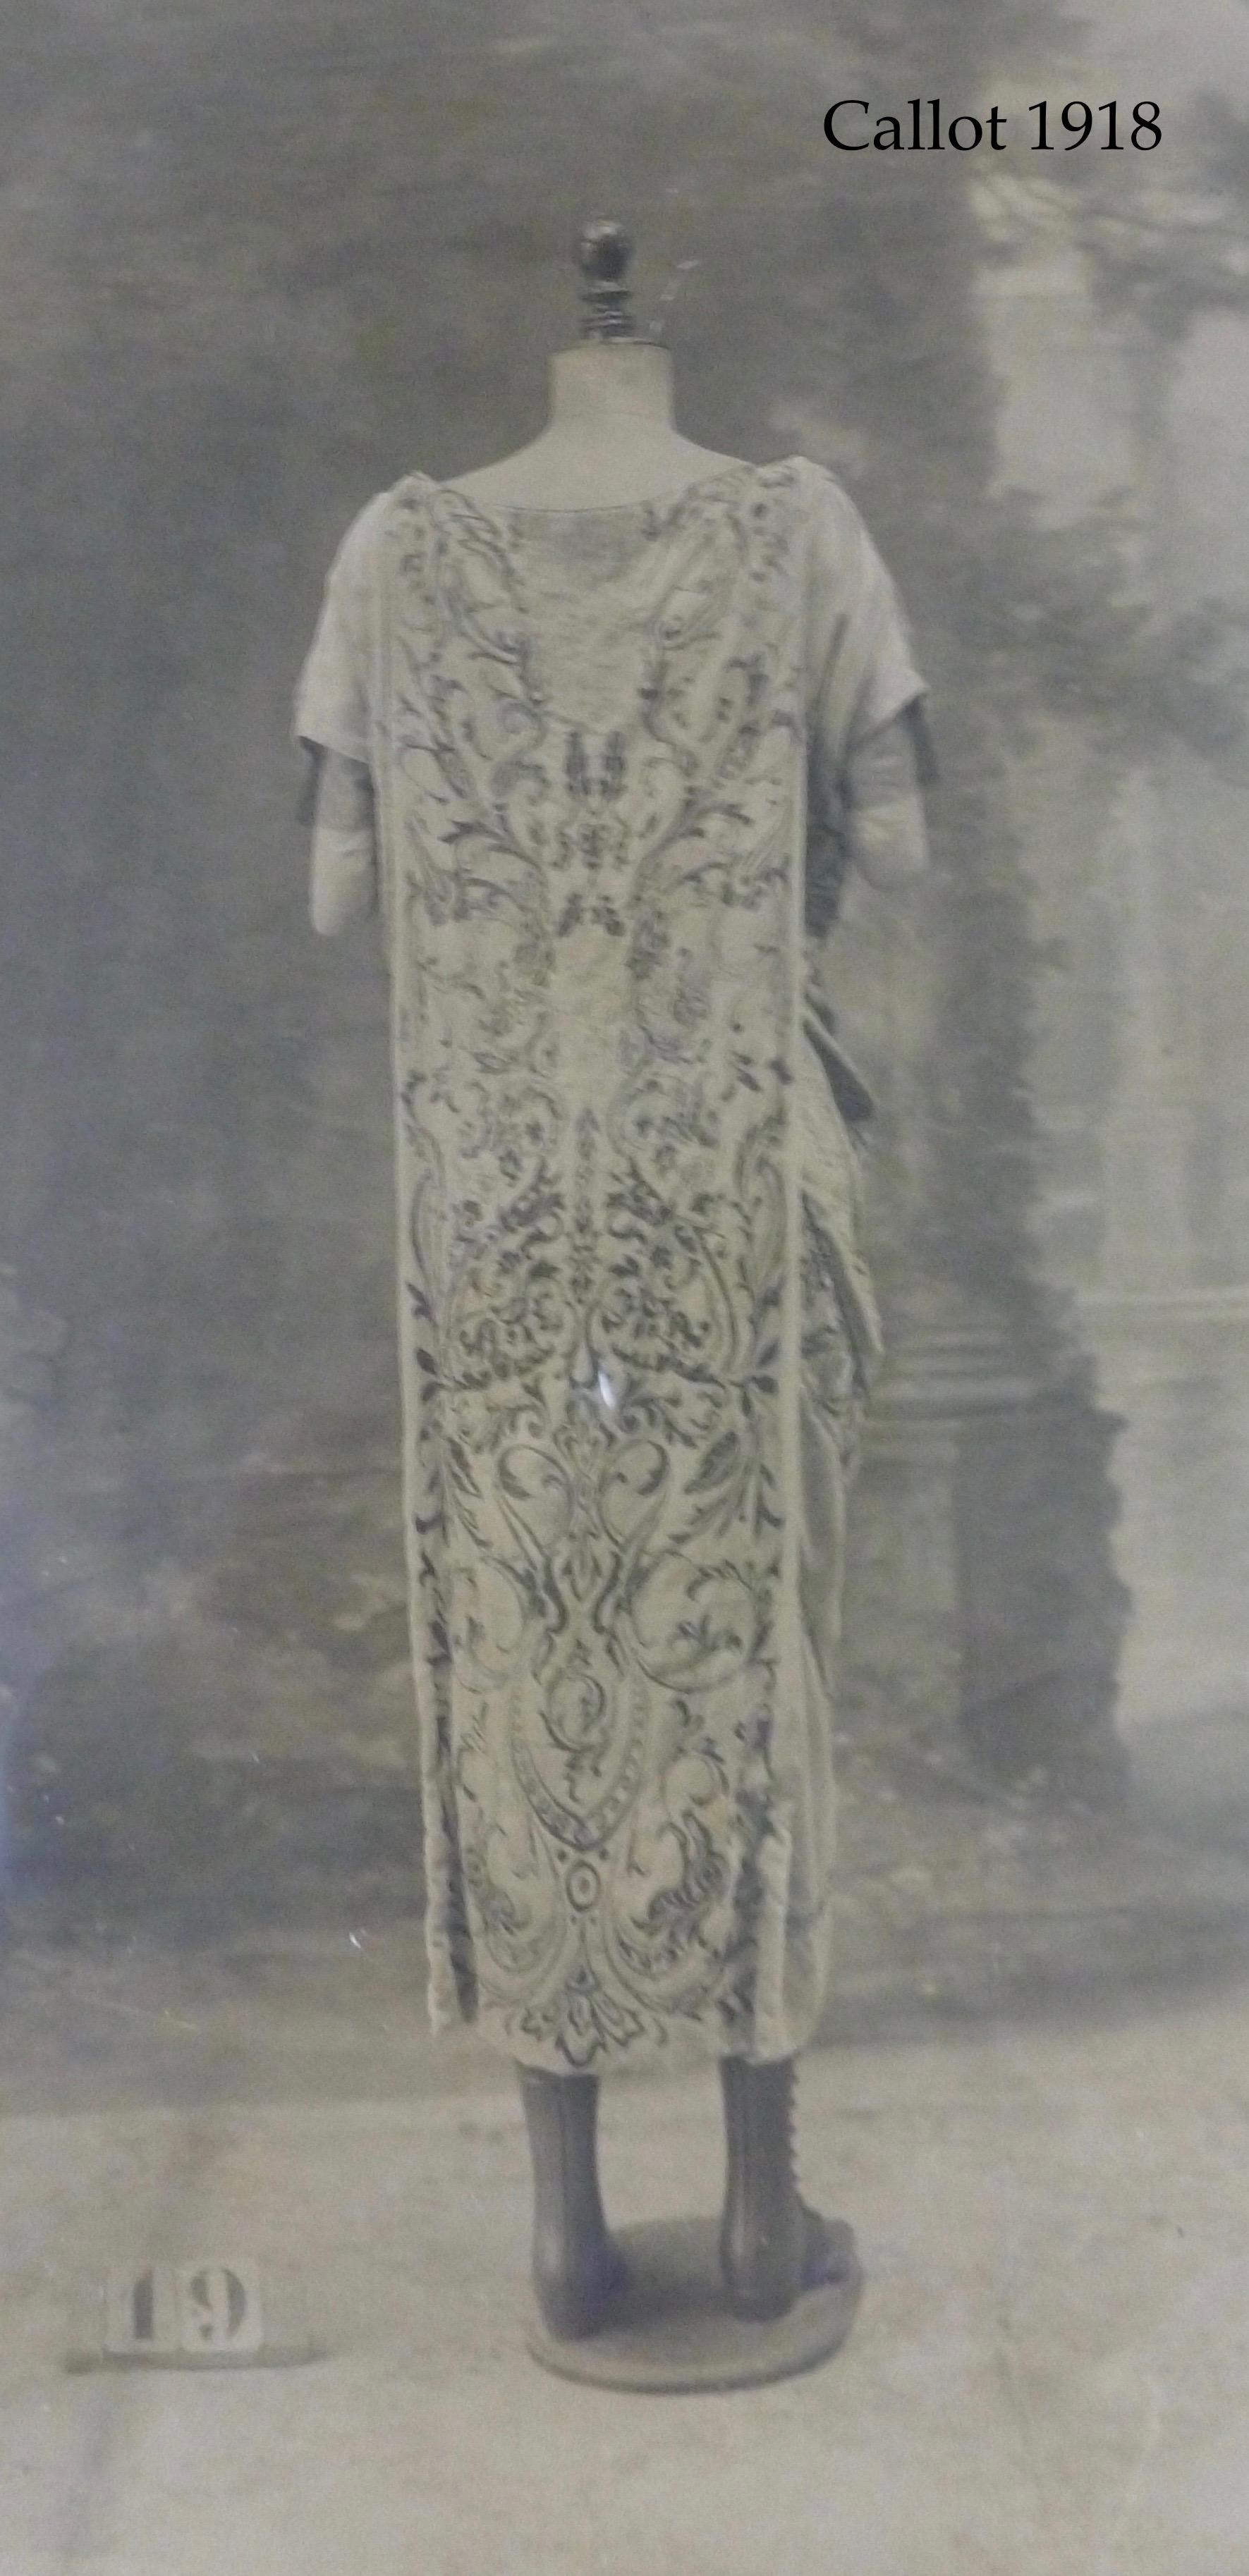 Callot 1918